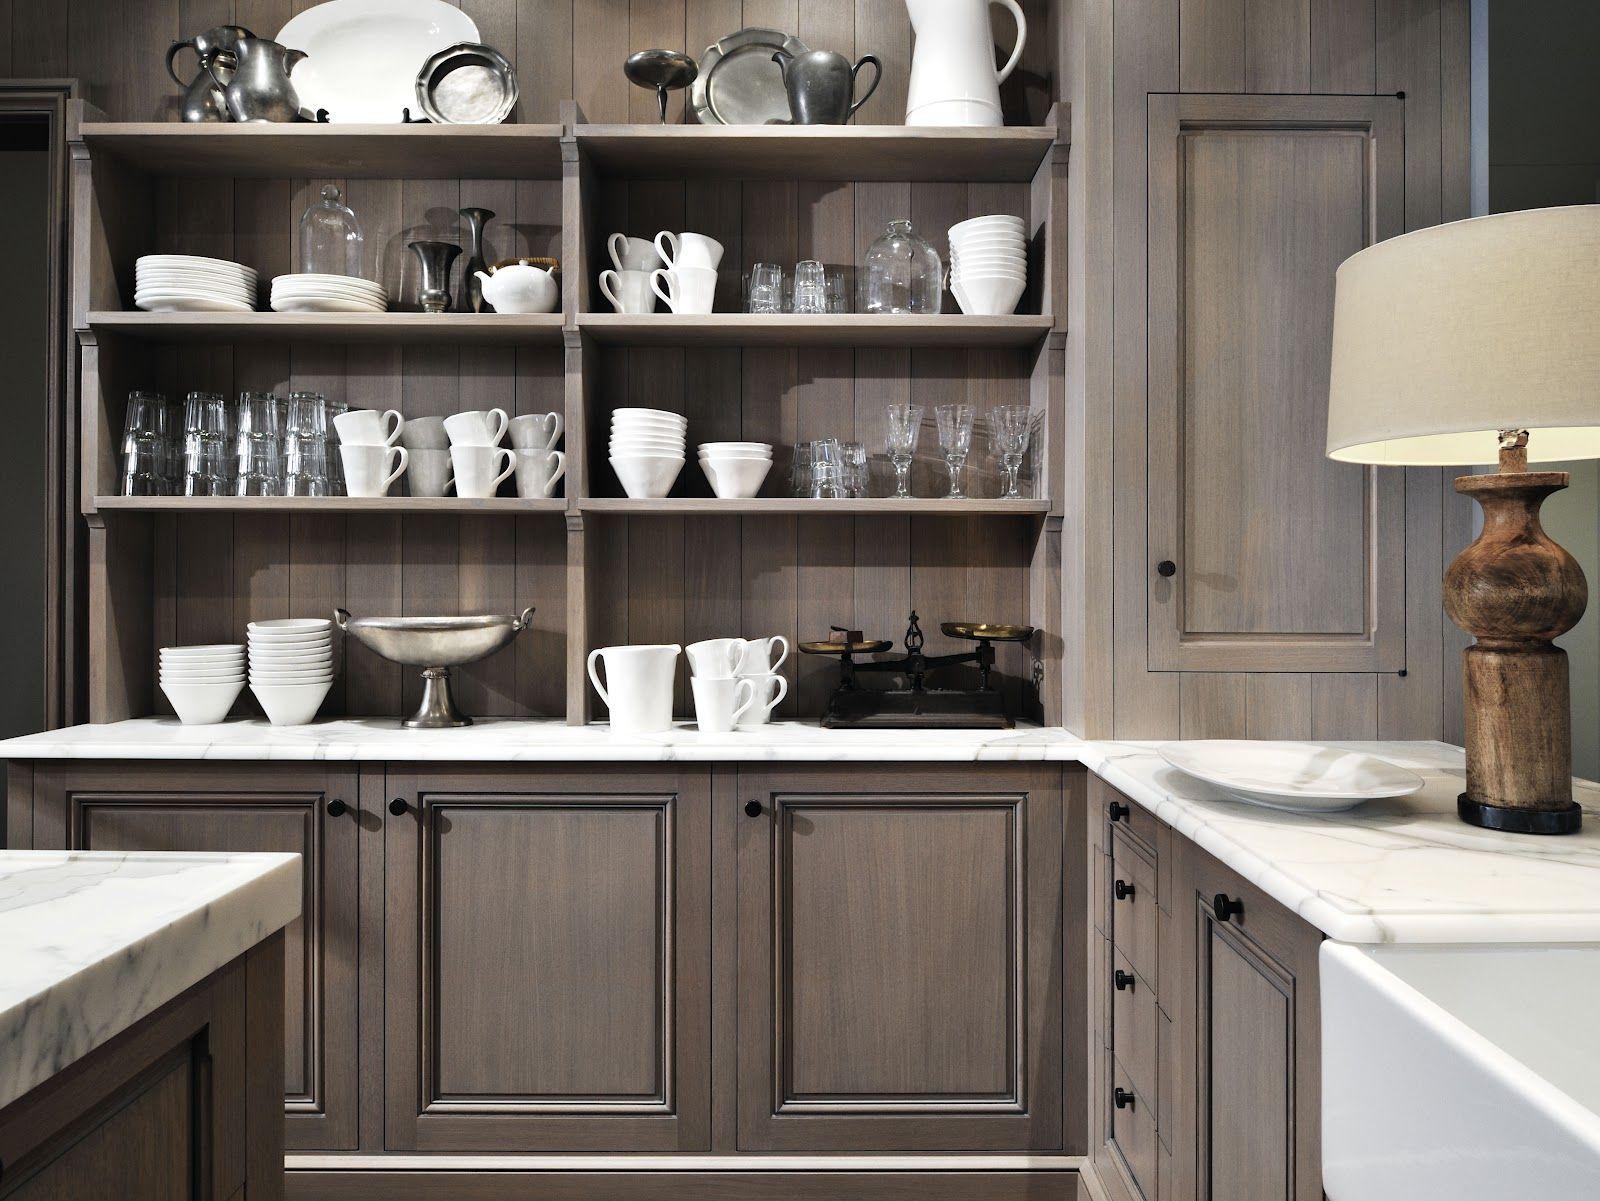 Firstrustickitchendecorationideasinwoodenopenkitchen Custom Kitchens With Grey Cabinets Decorating Design